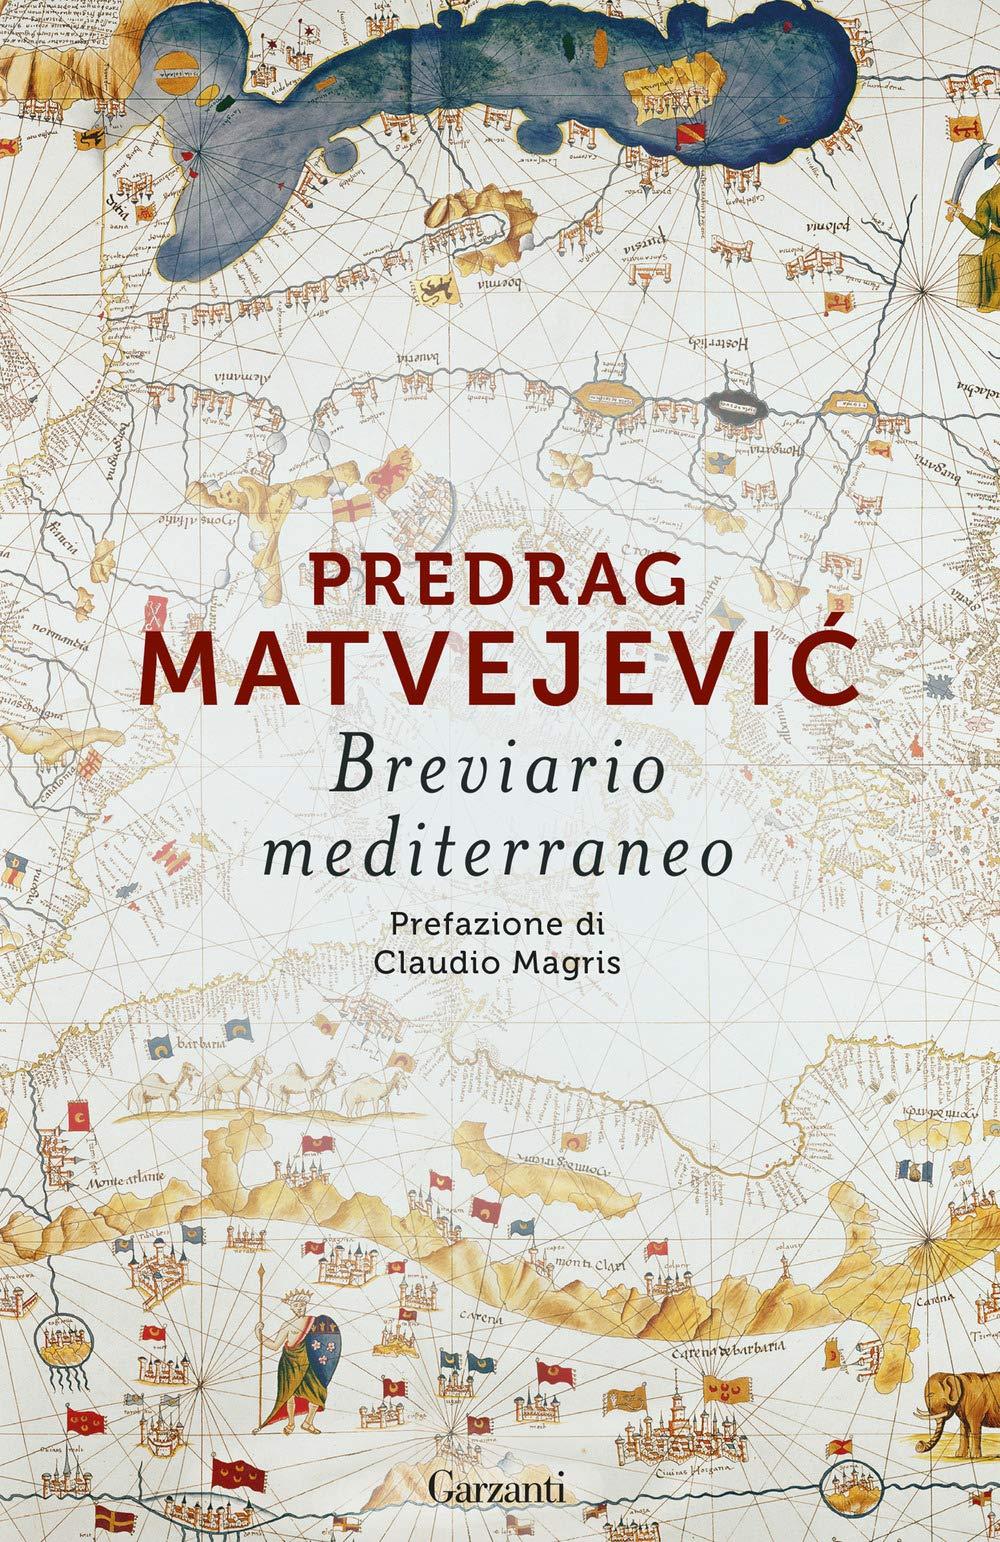 Breviario mediterraneo (Elefanti bestseller): Amazon.es: Matvejevic, Predrag, Ferrari, S.: Libros en idiomas extranjeros